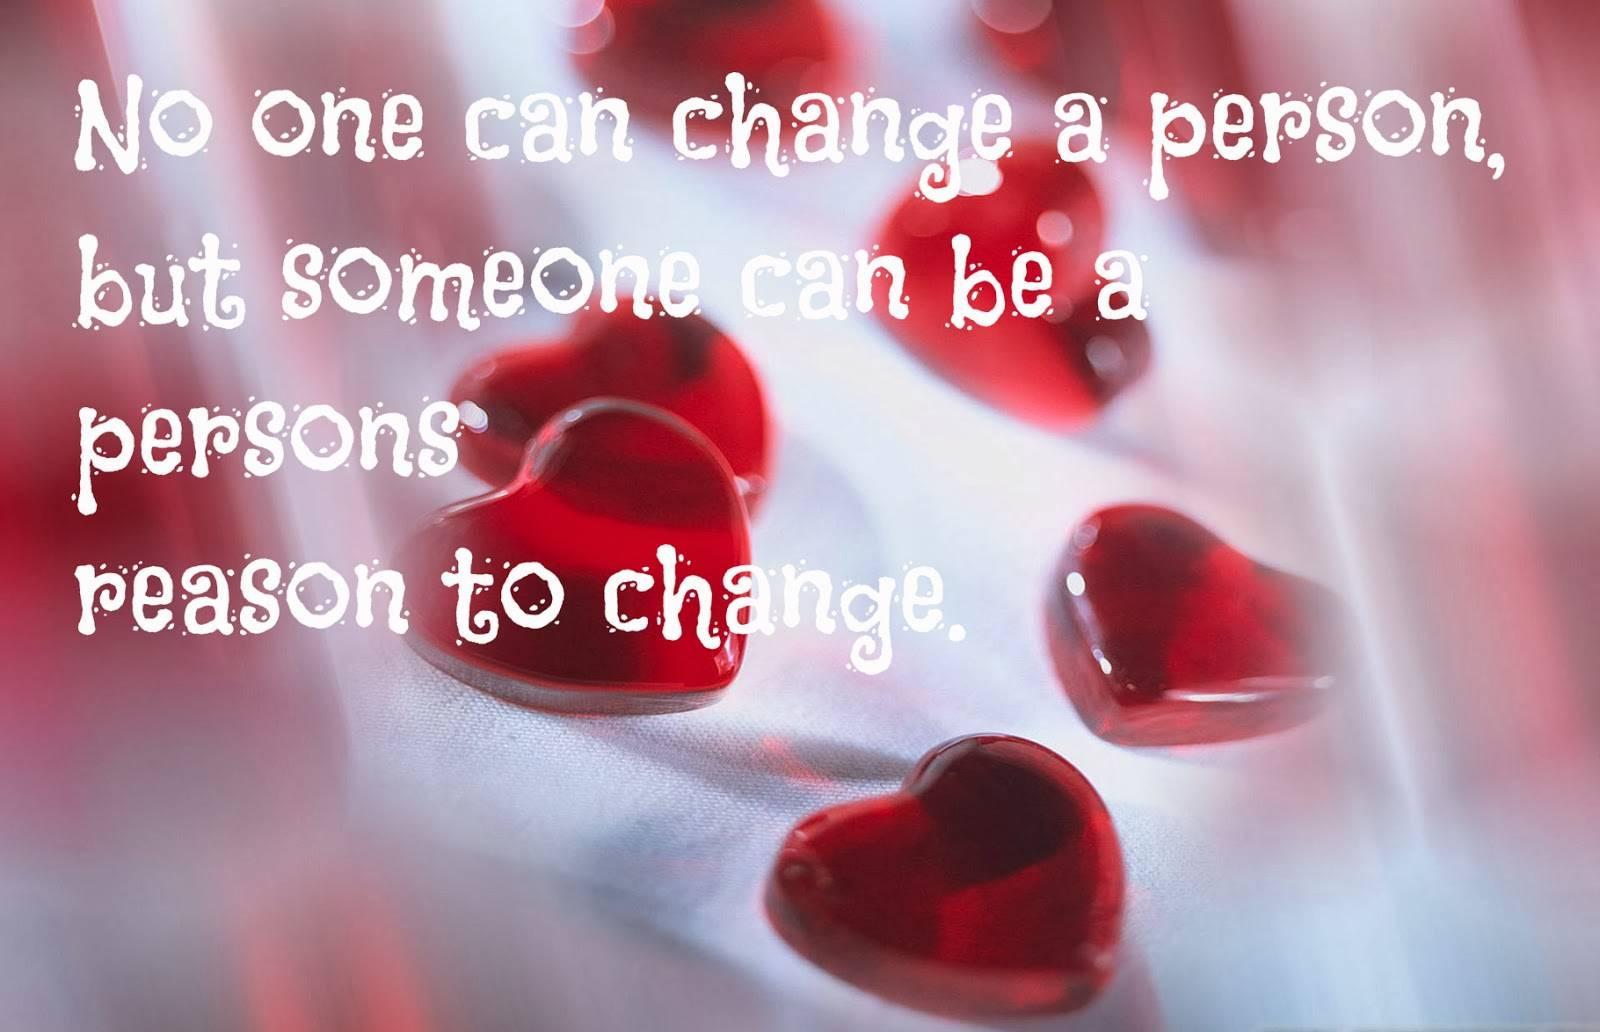 Wallpaper download new love - Love Wallpaper Free Download 2 Ahd Images